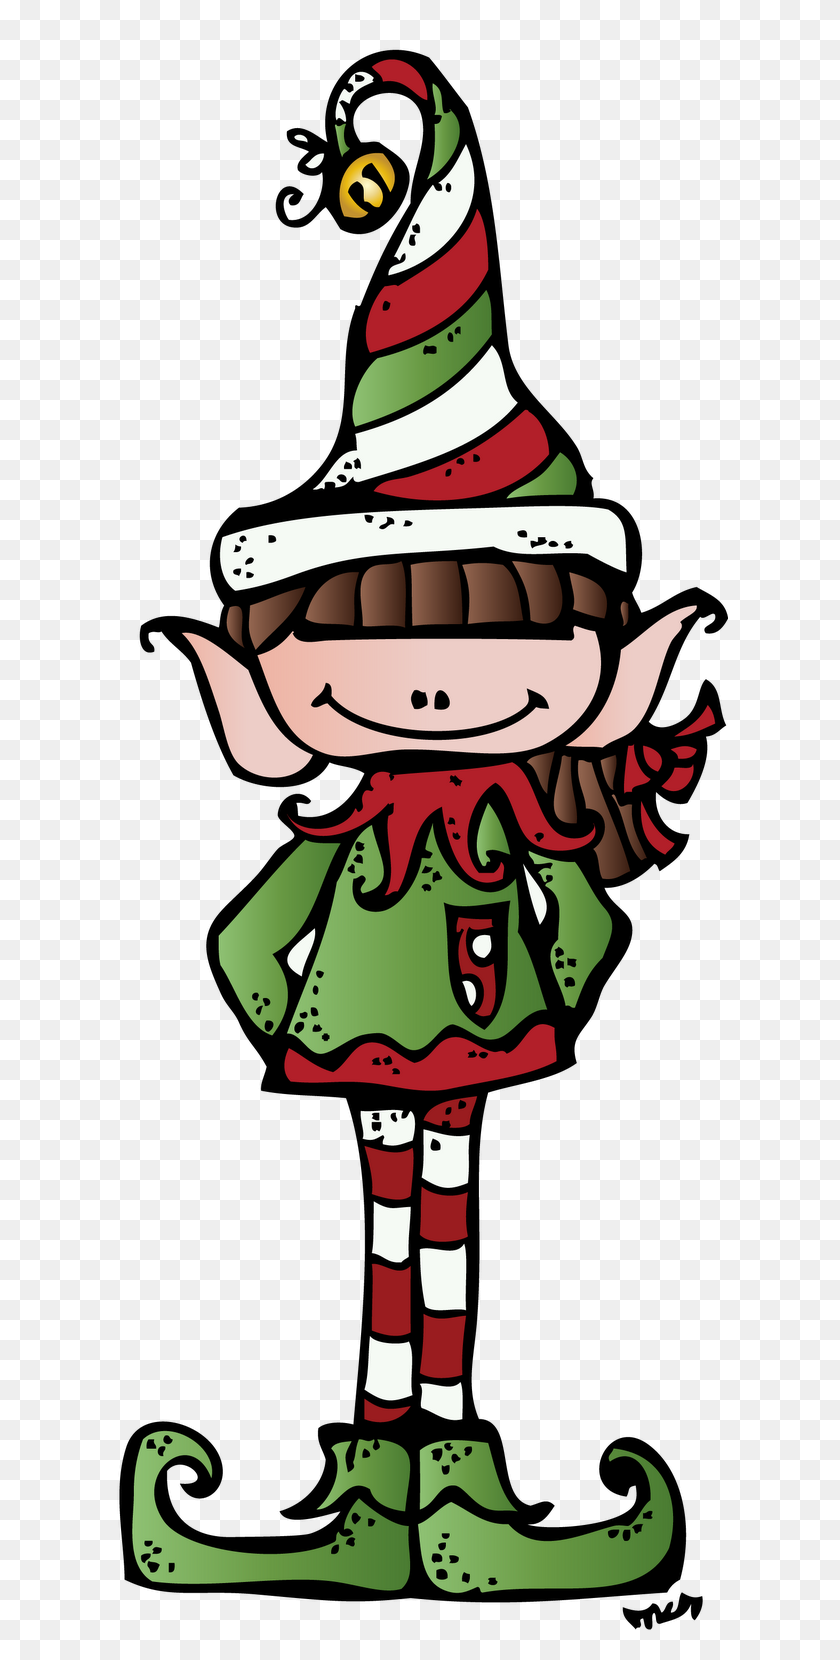 616x1600 Melonheadz Clip Art - Melonheadz Christmas Clipart